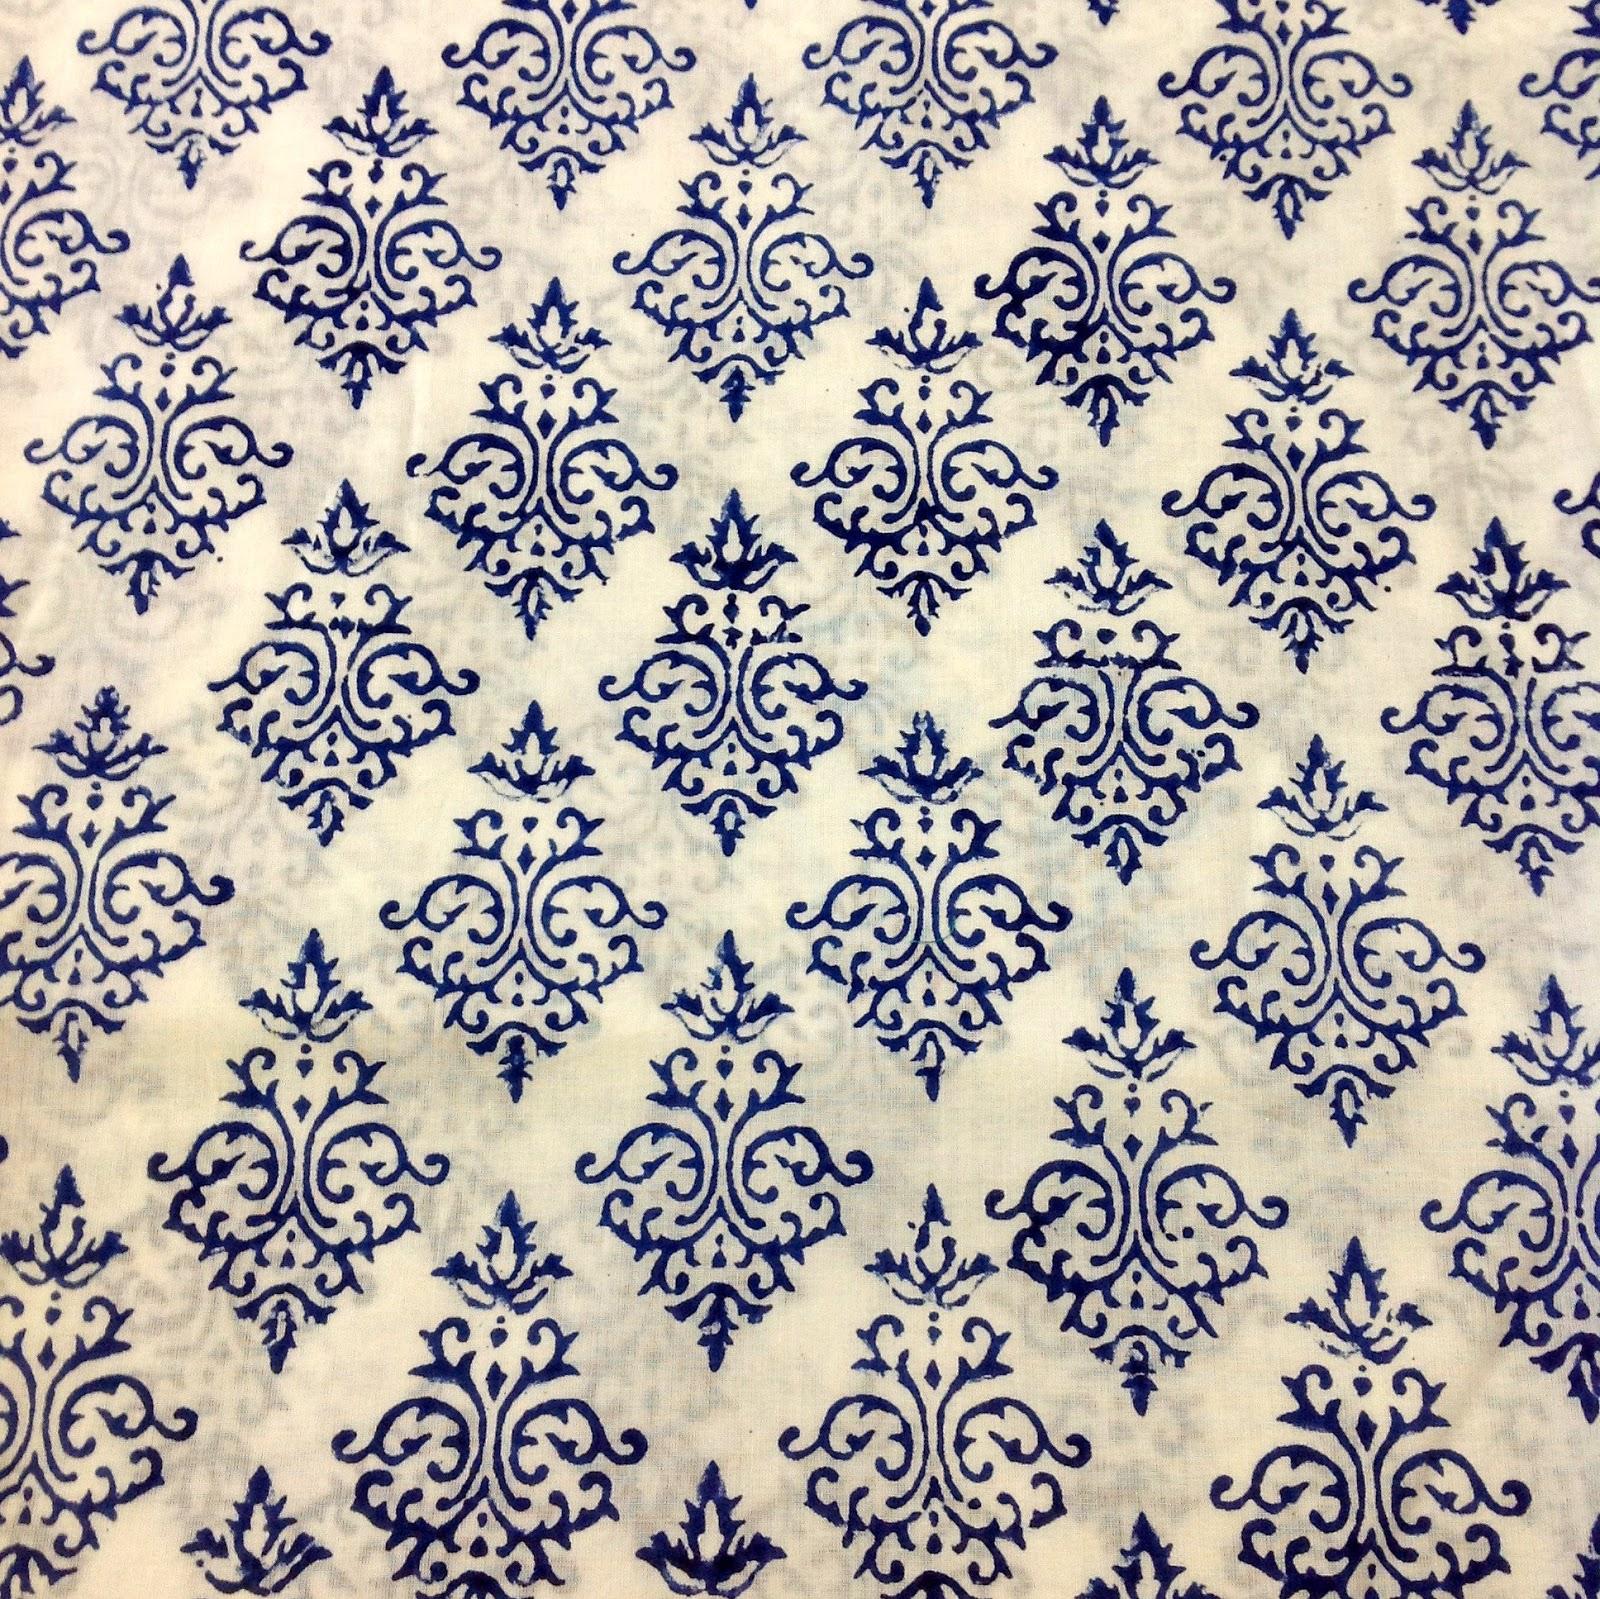 Desicrafts Indian Block Print Fabric Organic Cotton